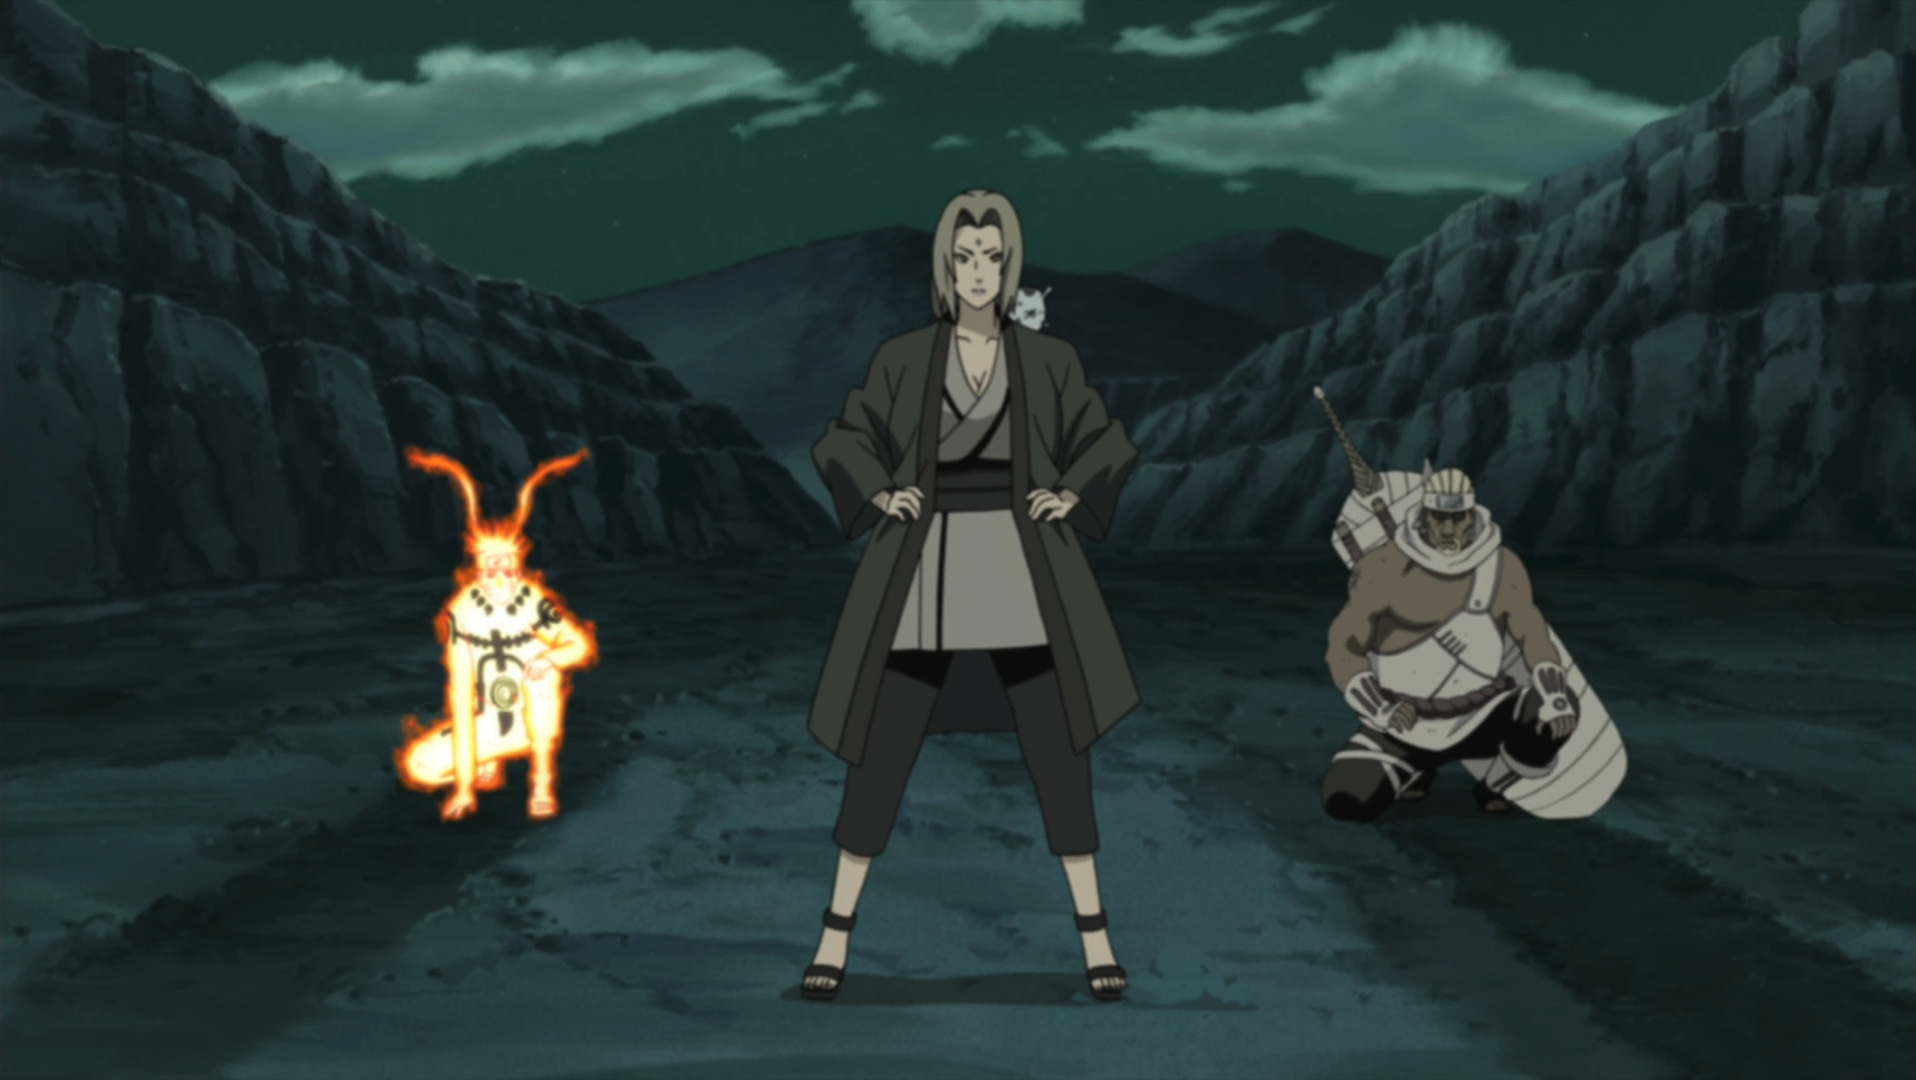 Naruto History And Descriptions: Tsunade